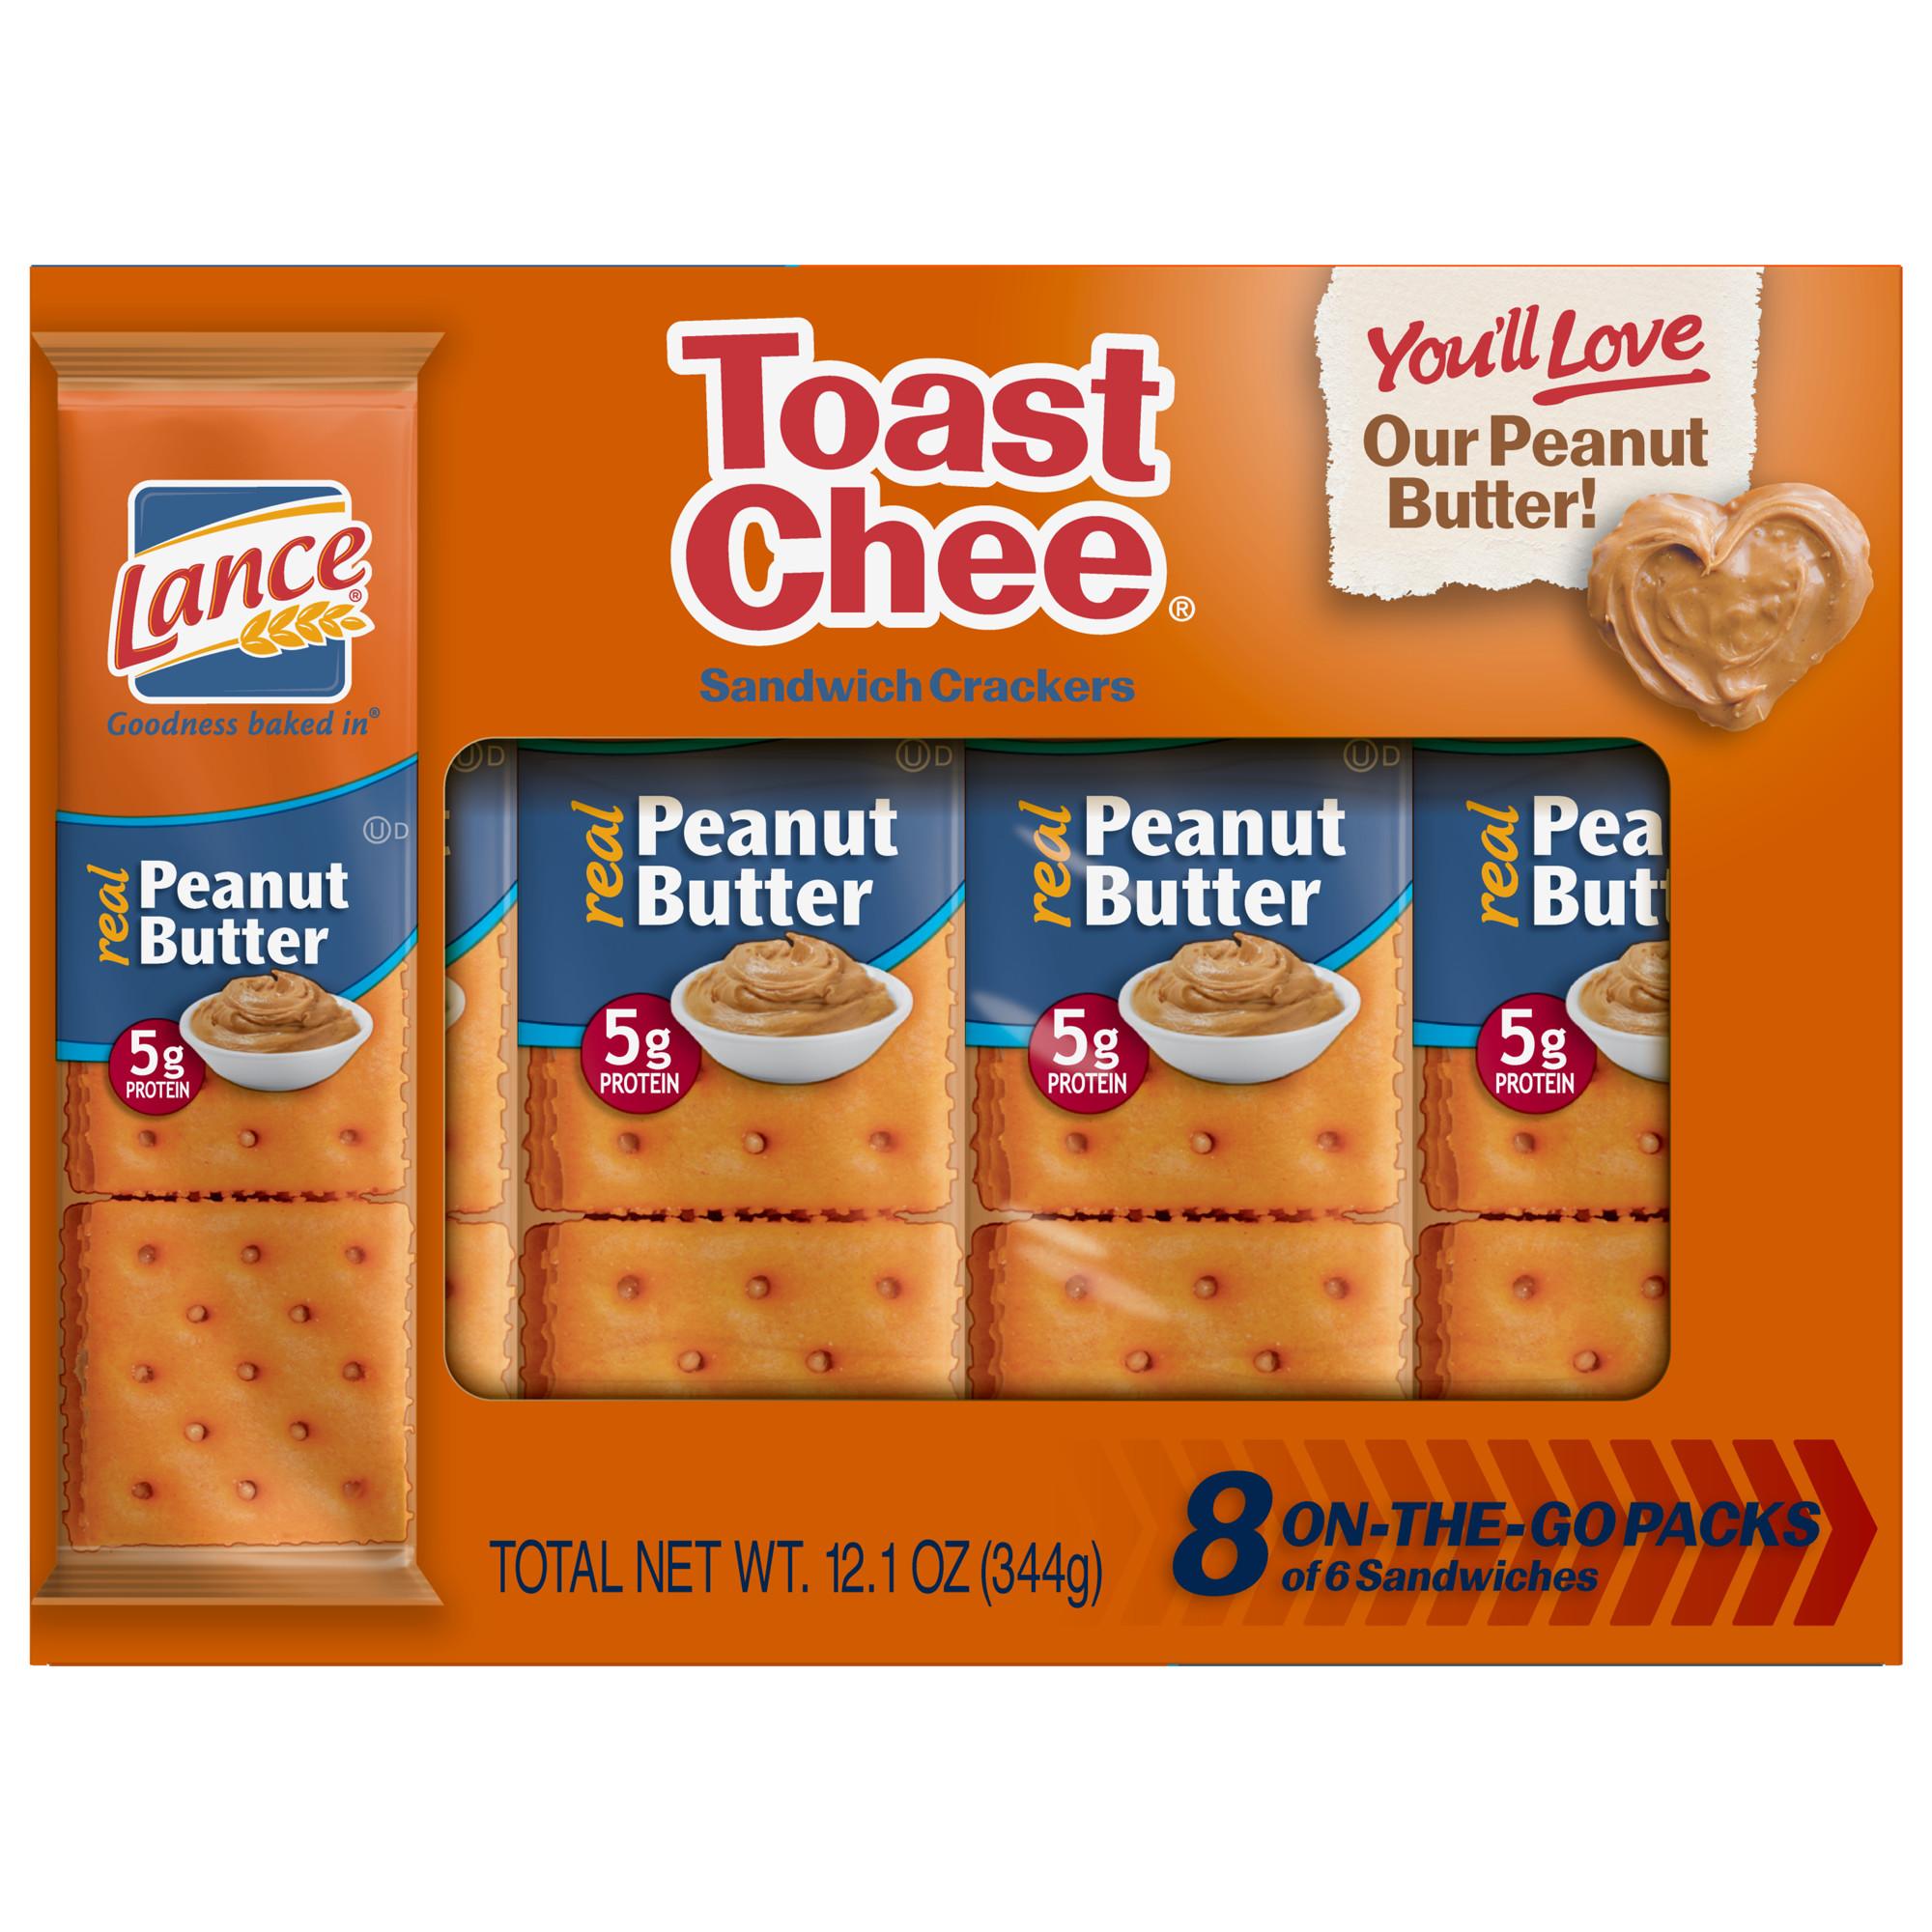 Lance ToastChee Peanut Butter Sandwich Crackers, 8 Ct